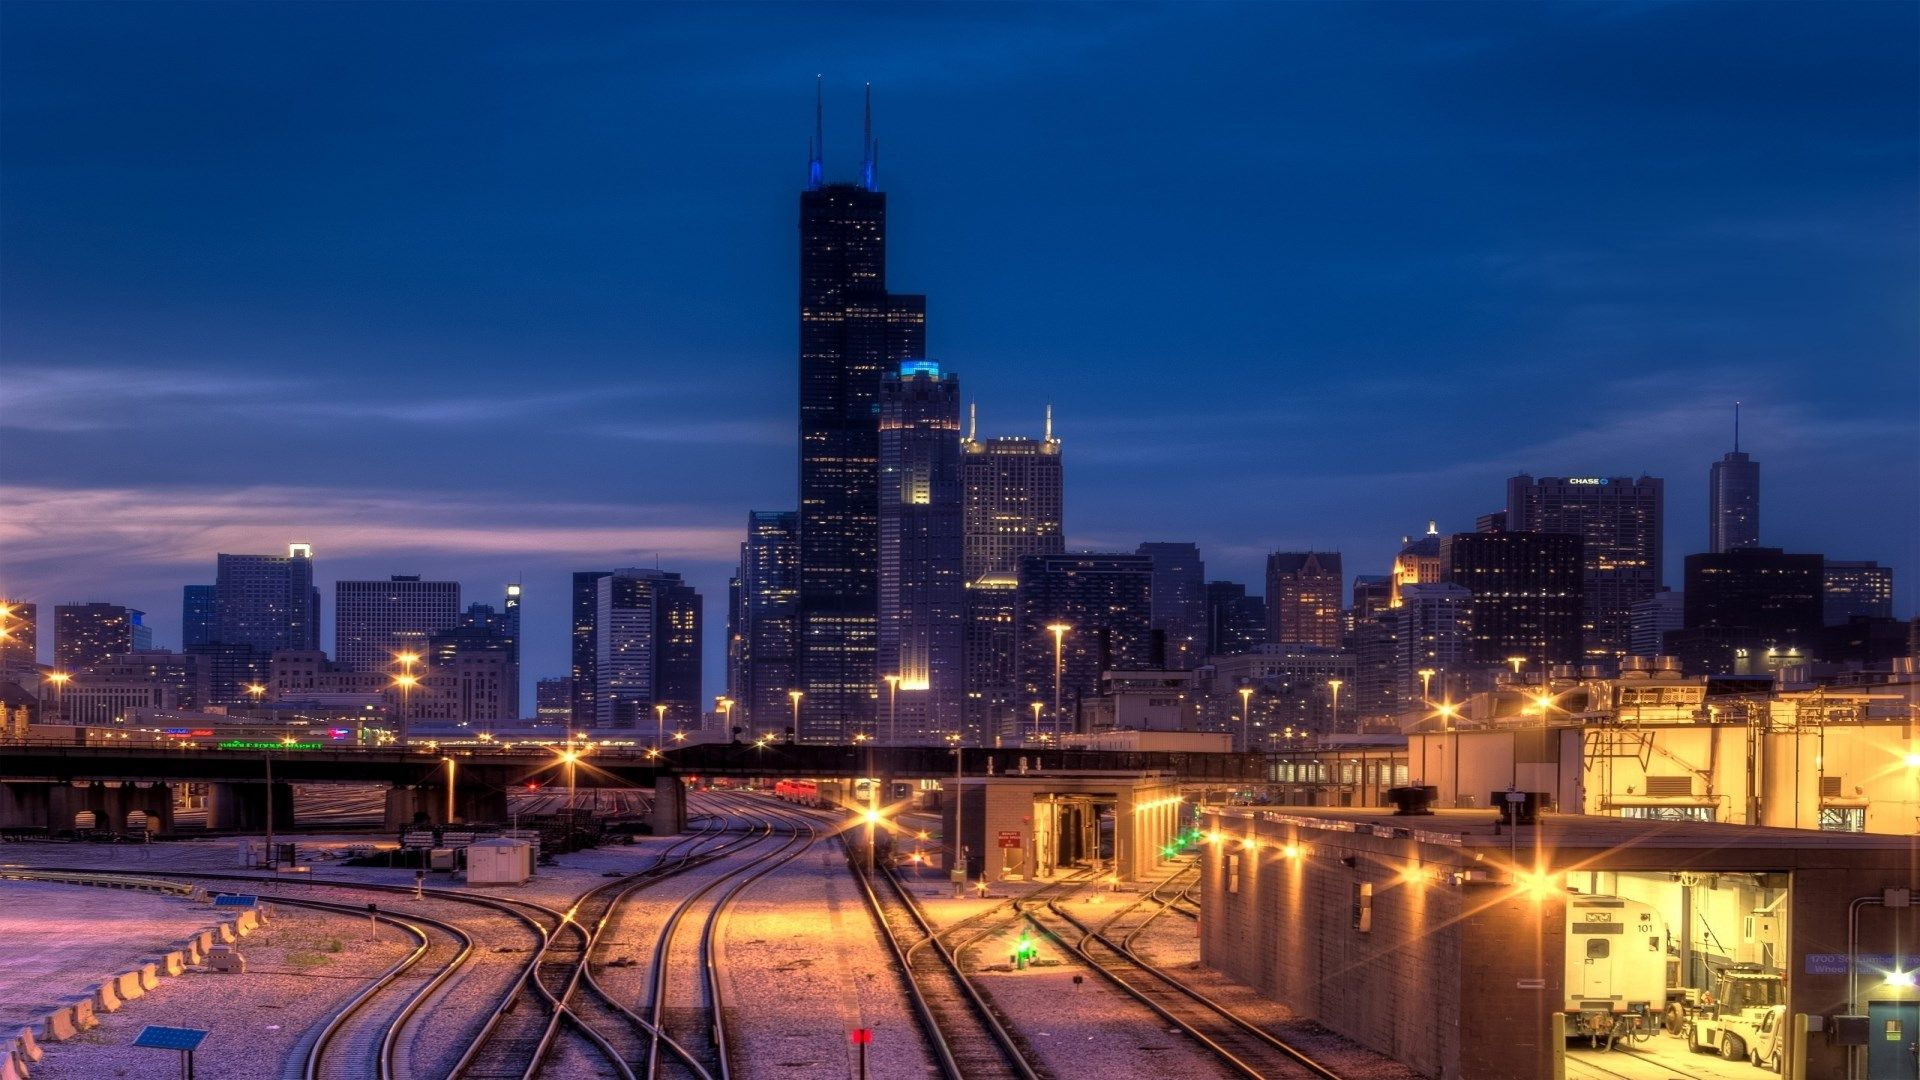 chicago wallpapers hd for desktop Chicago wallpaper